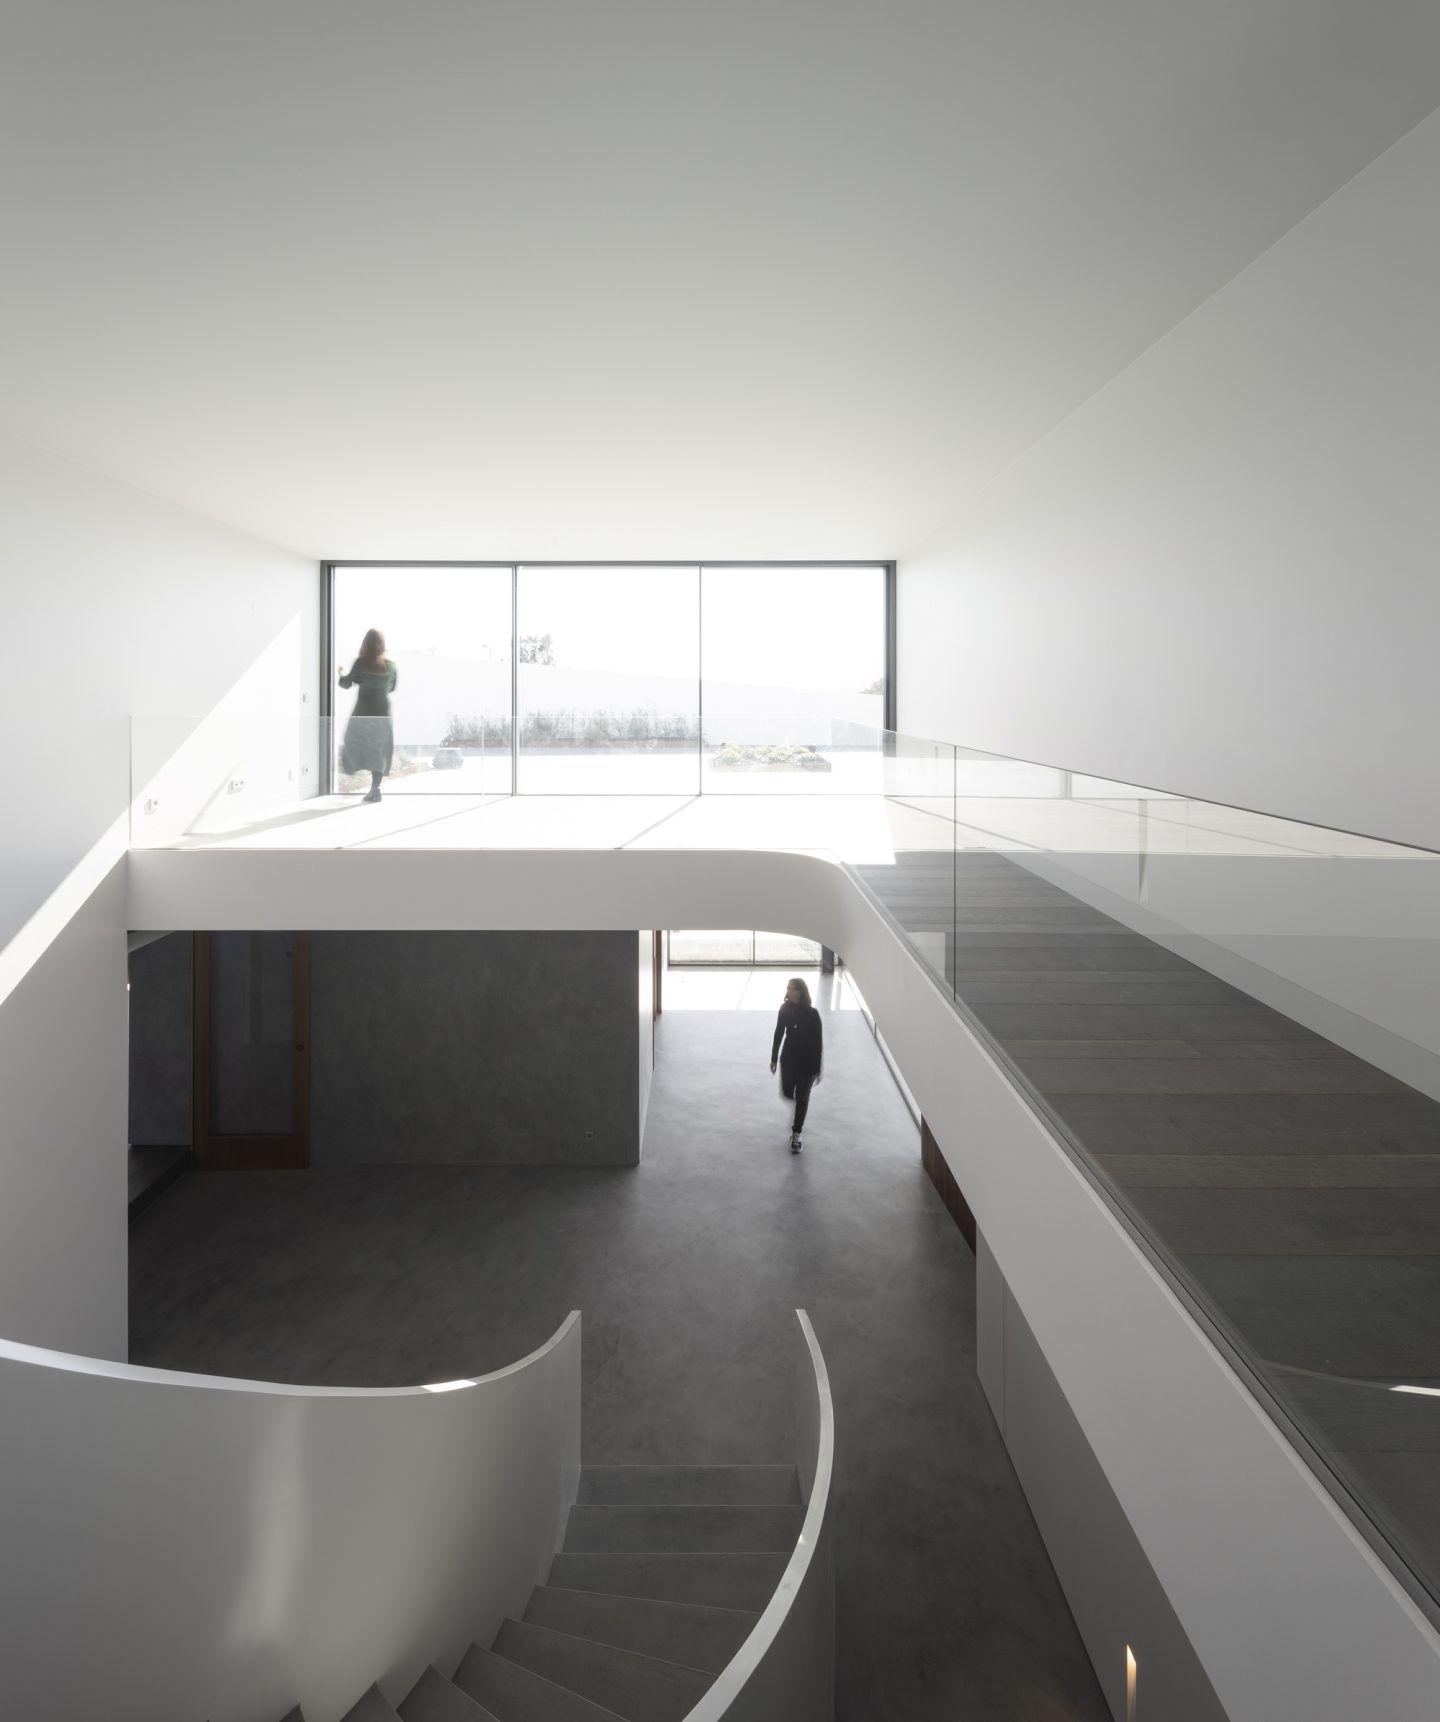 IGNANT-Architecture-Bica-Arquitectos-Belas-Clube-de-Campo-House-017